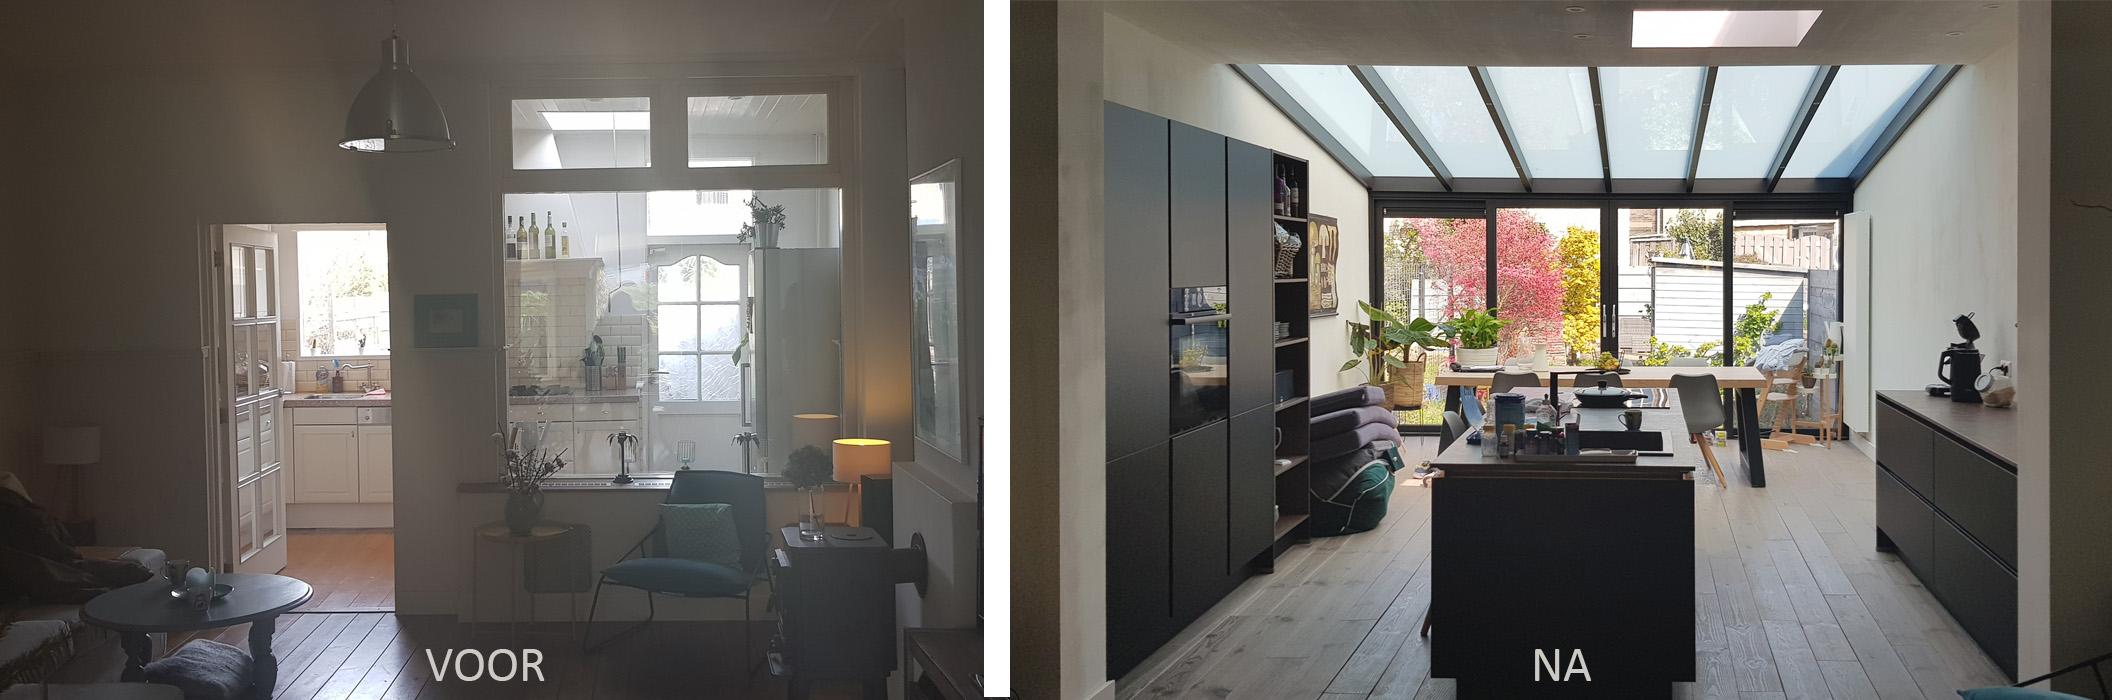 Aanbouw serre en verbouwing woning Rotterdam